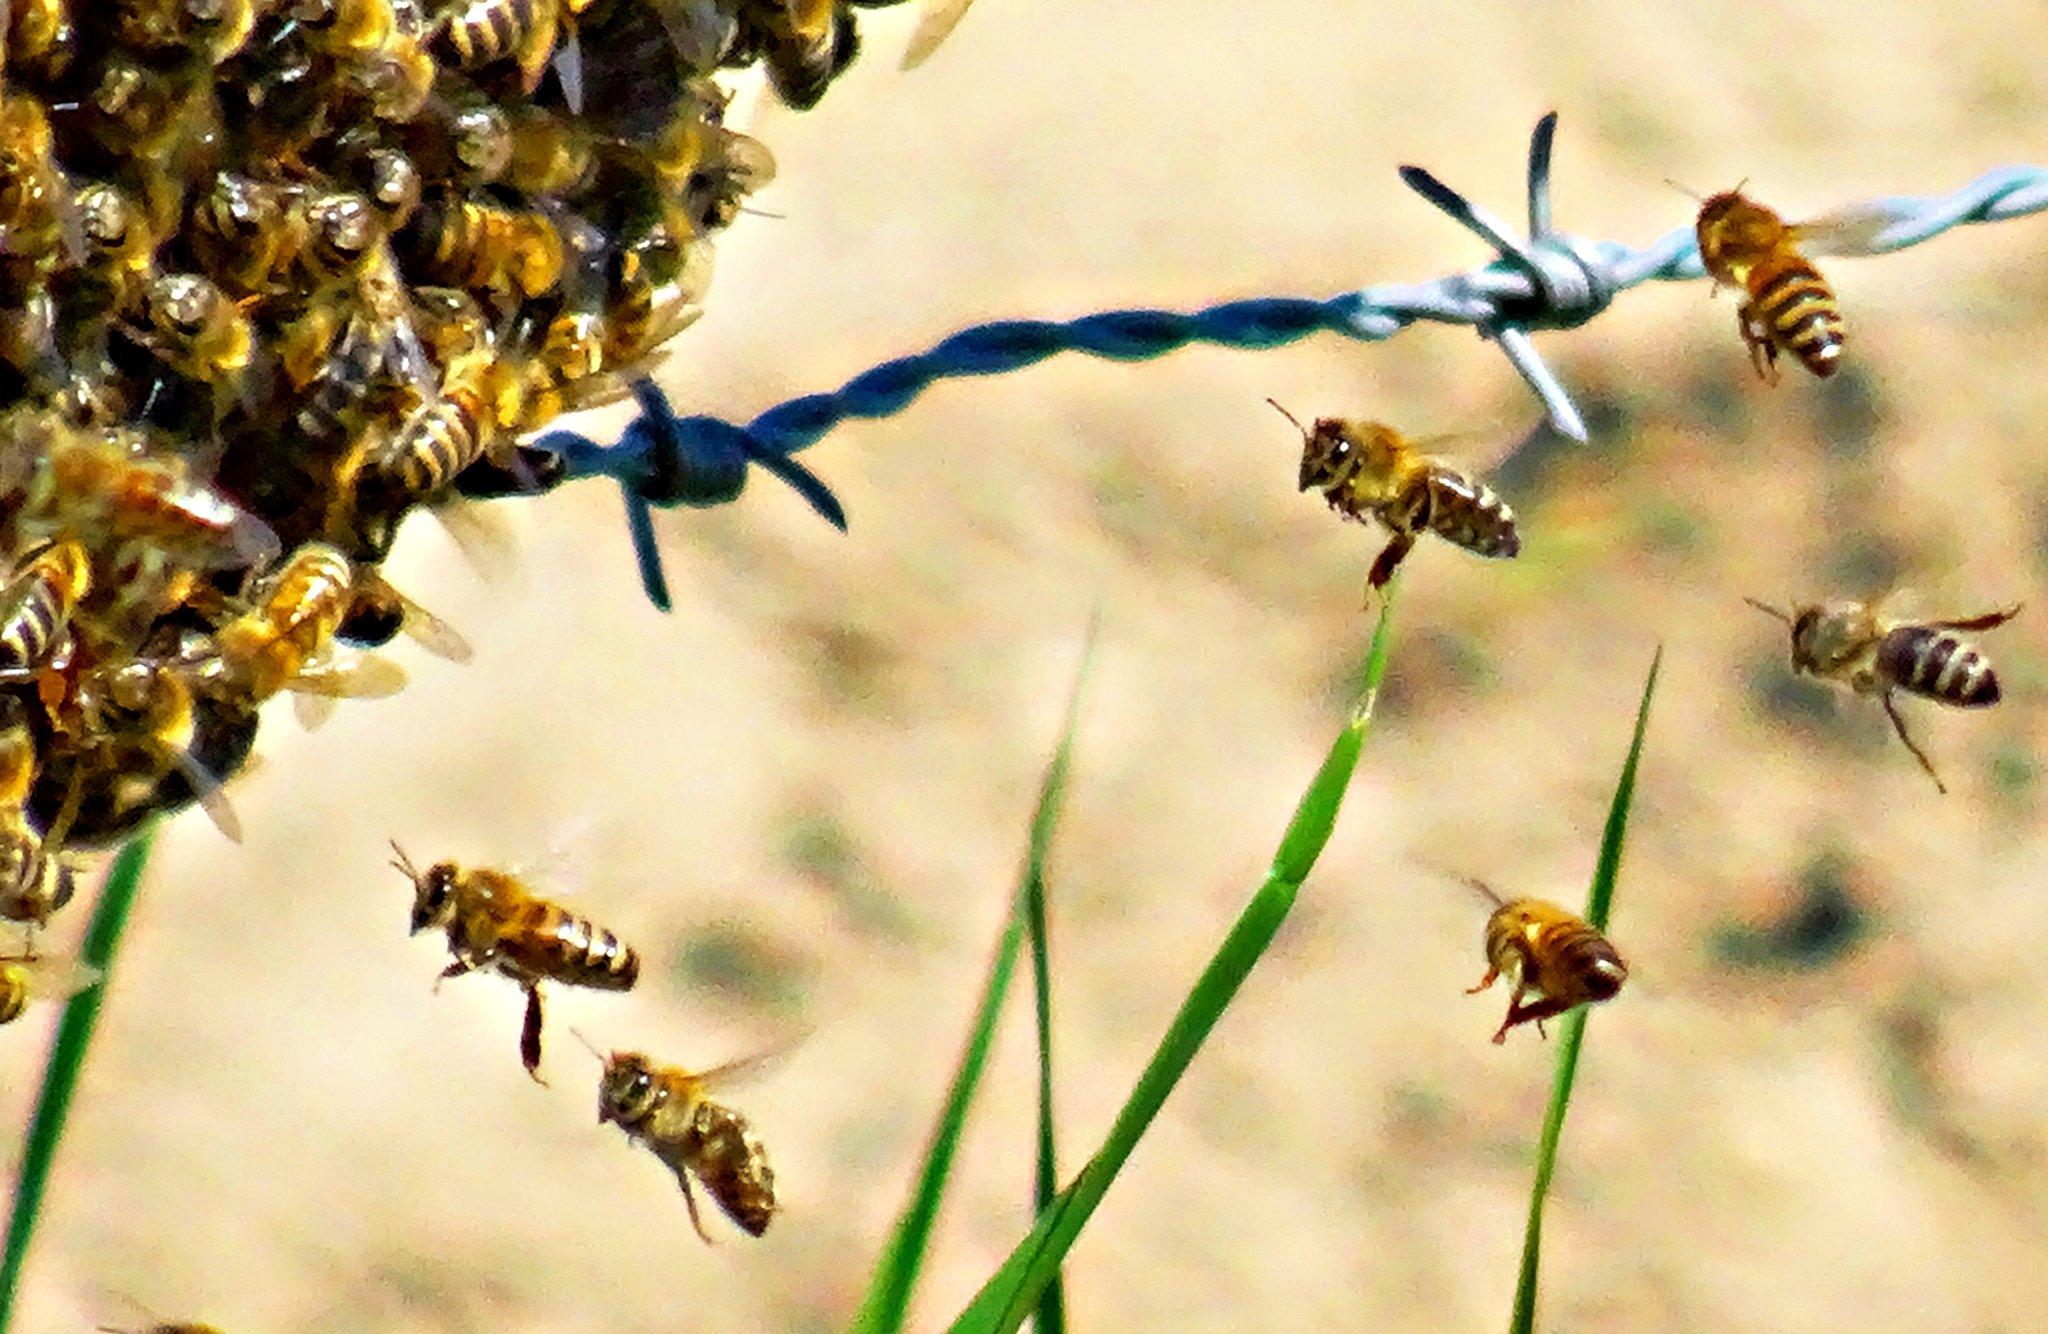 Europäische Union verbietet das Neonikotinoid Thiacloprid ab Mai 2020